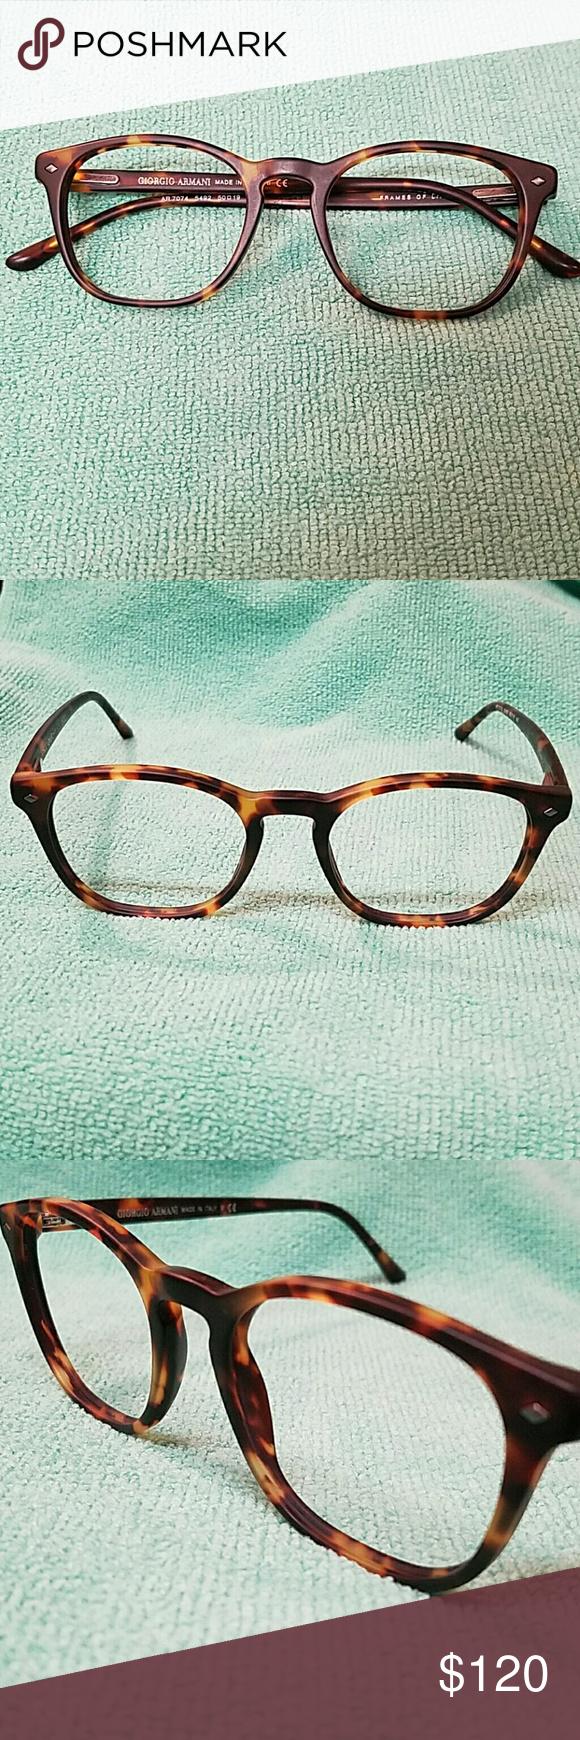 44640ef9faa0 Giorgio Armani AR7074 5492 Giorgio Armani Tortoise Eyeframe. No case. Frame  only. Giorgio Armani Accessories Glasses